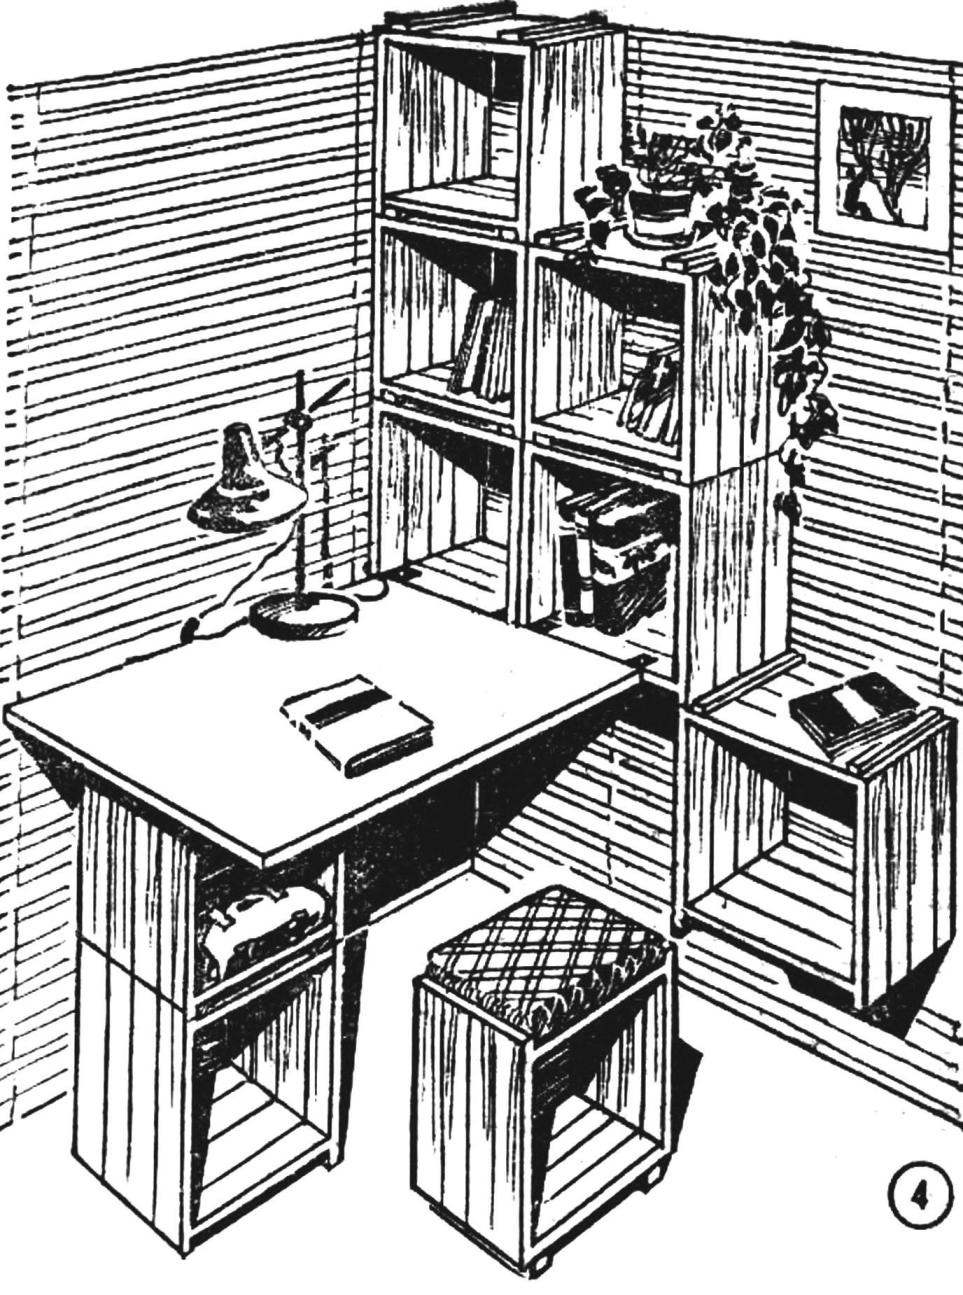 Рис. 4. Рабочий уголок: полки, тумбочка со столом, табурет.